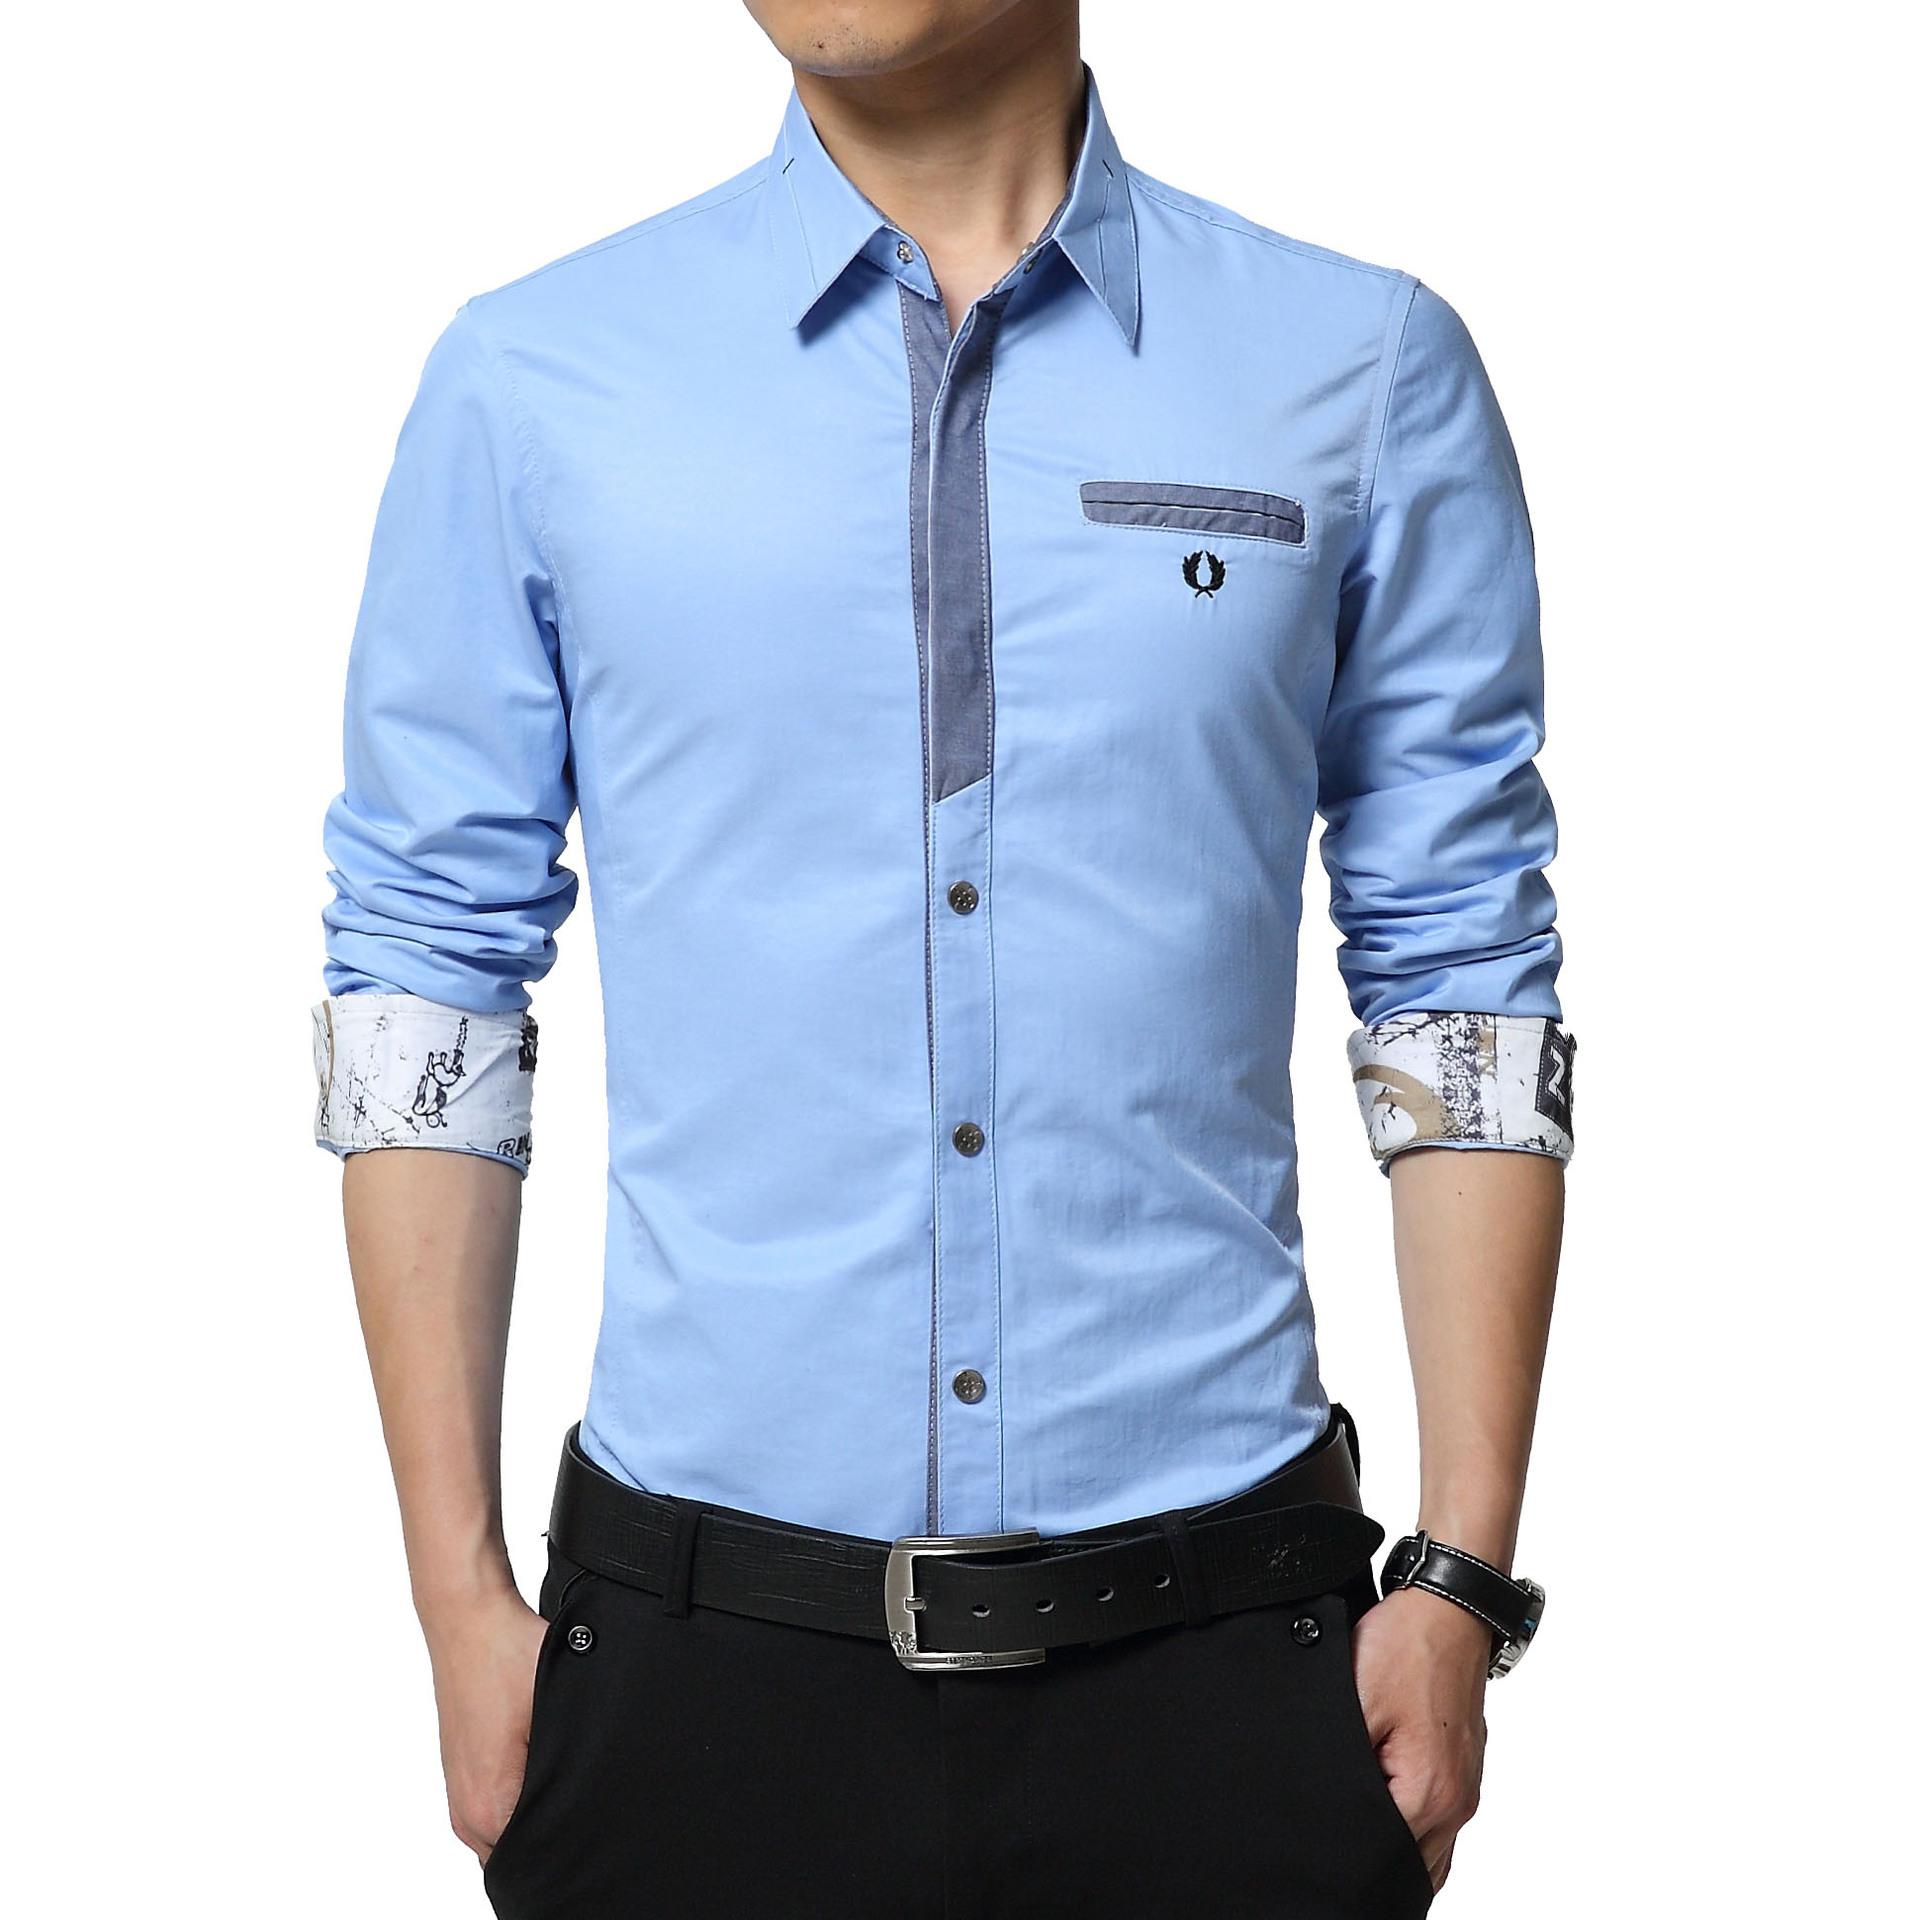 Floral Print Striped Dress Men Shirt Uniform Mens Long Sleeve Slim Fit Top Vintage Cotton Button Down Shirts Camisa Masculina 39